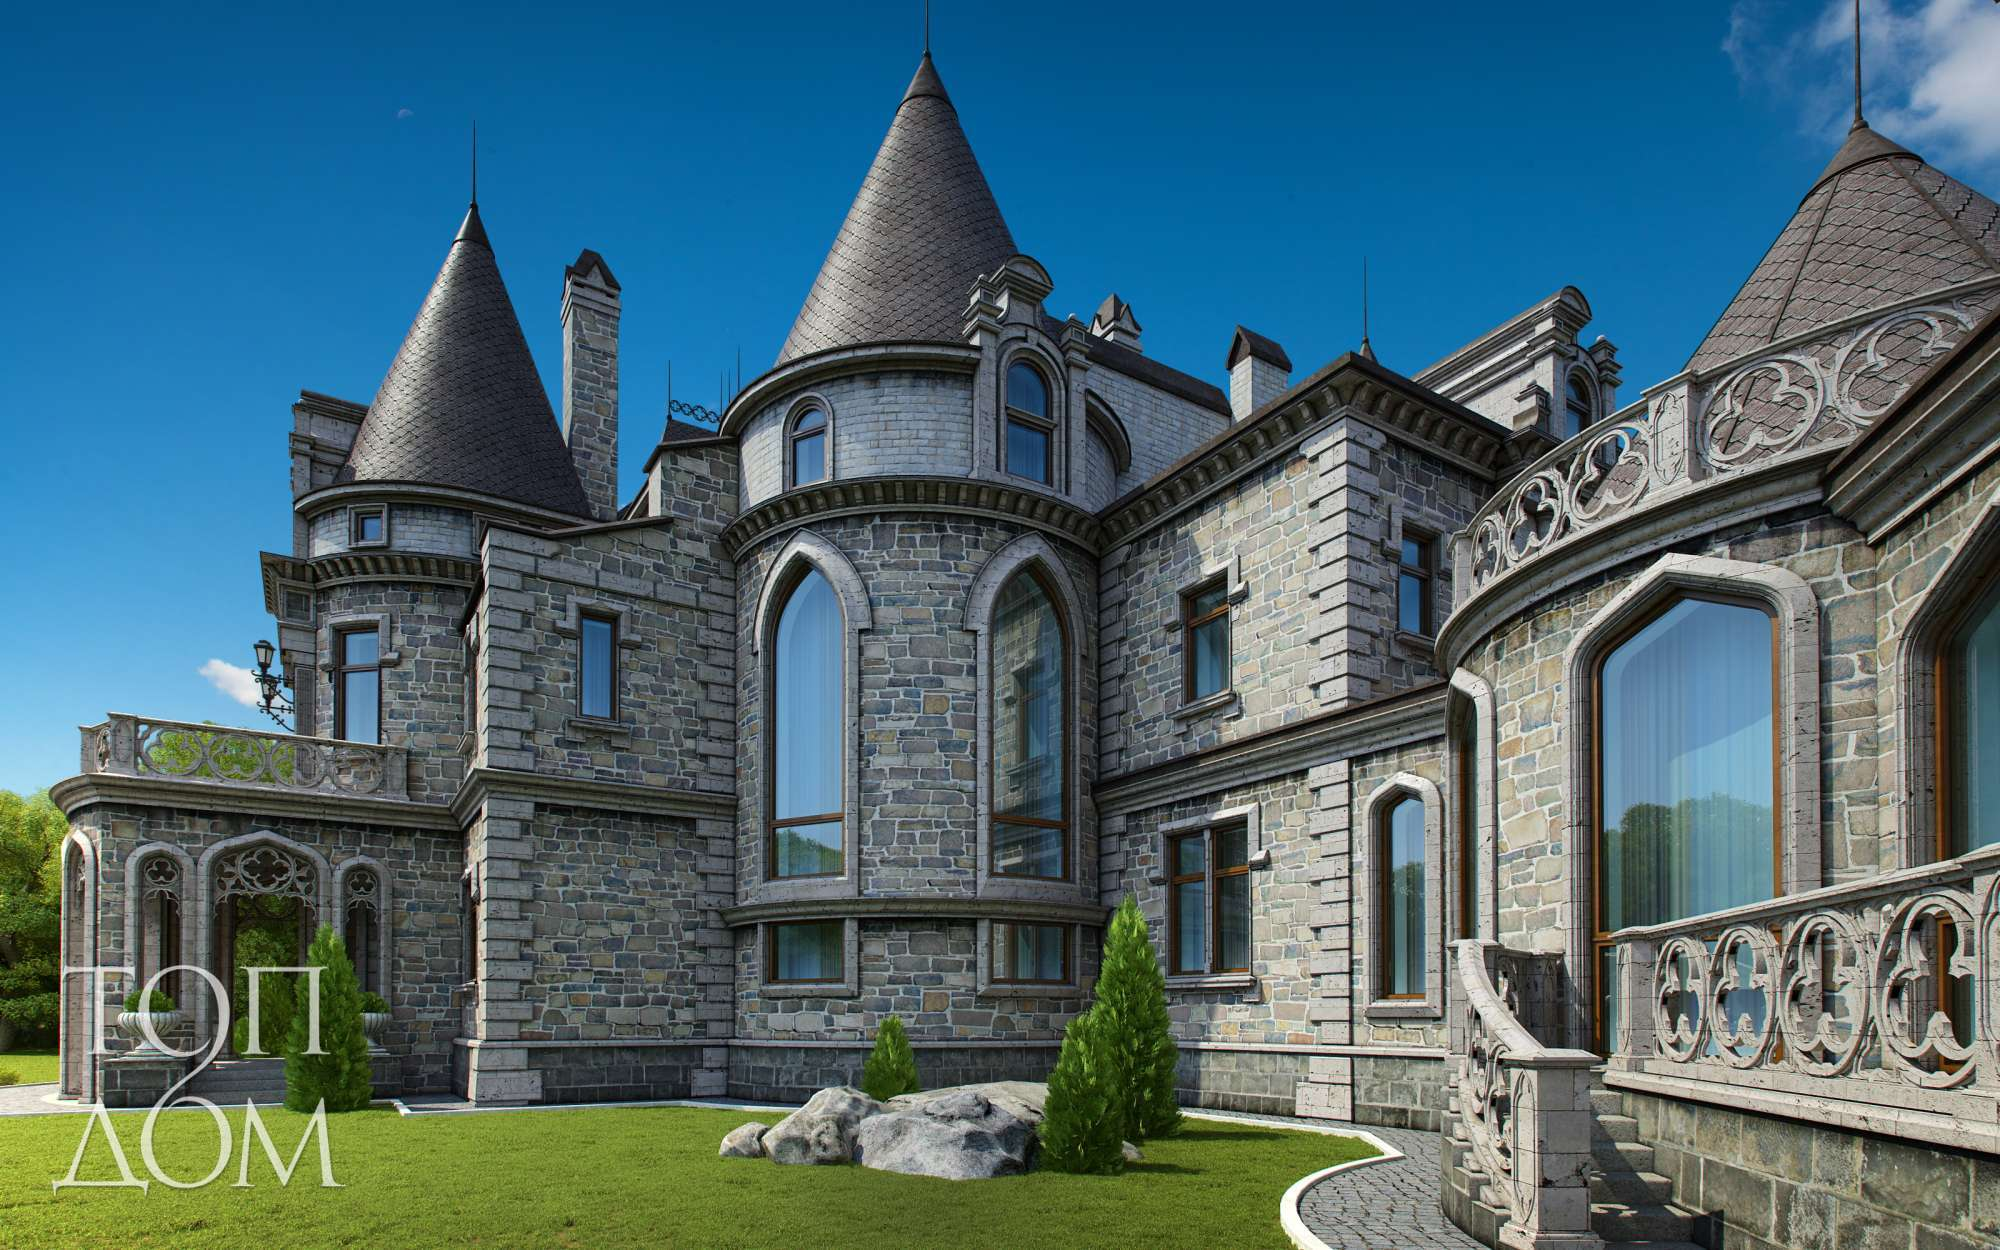 в замок стиле фото проекты домов